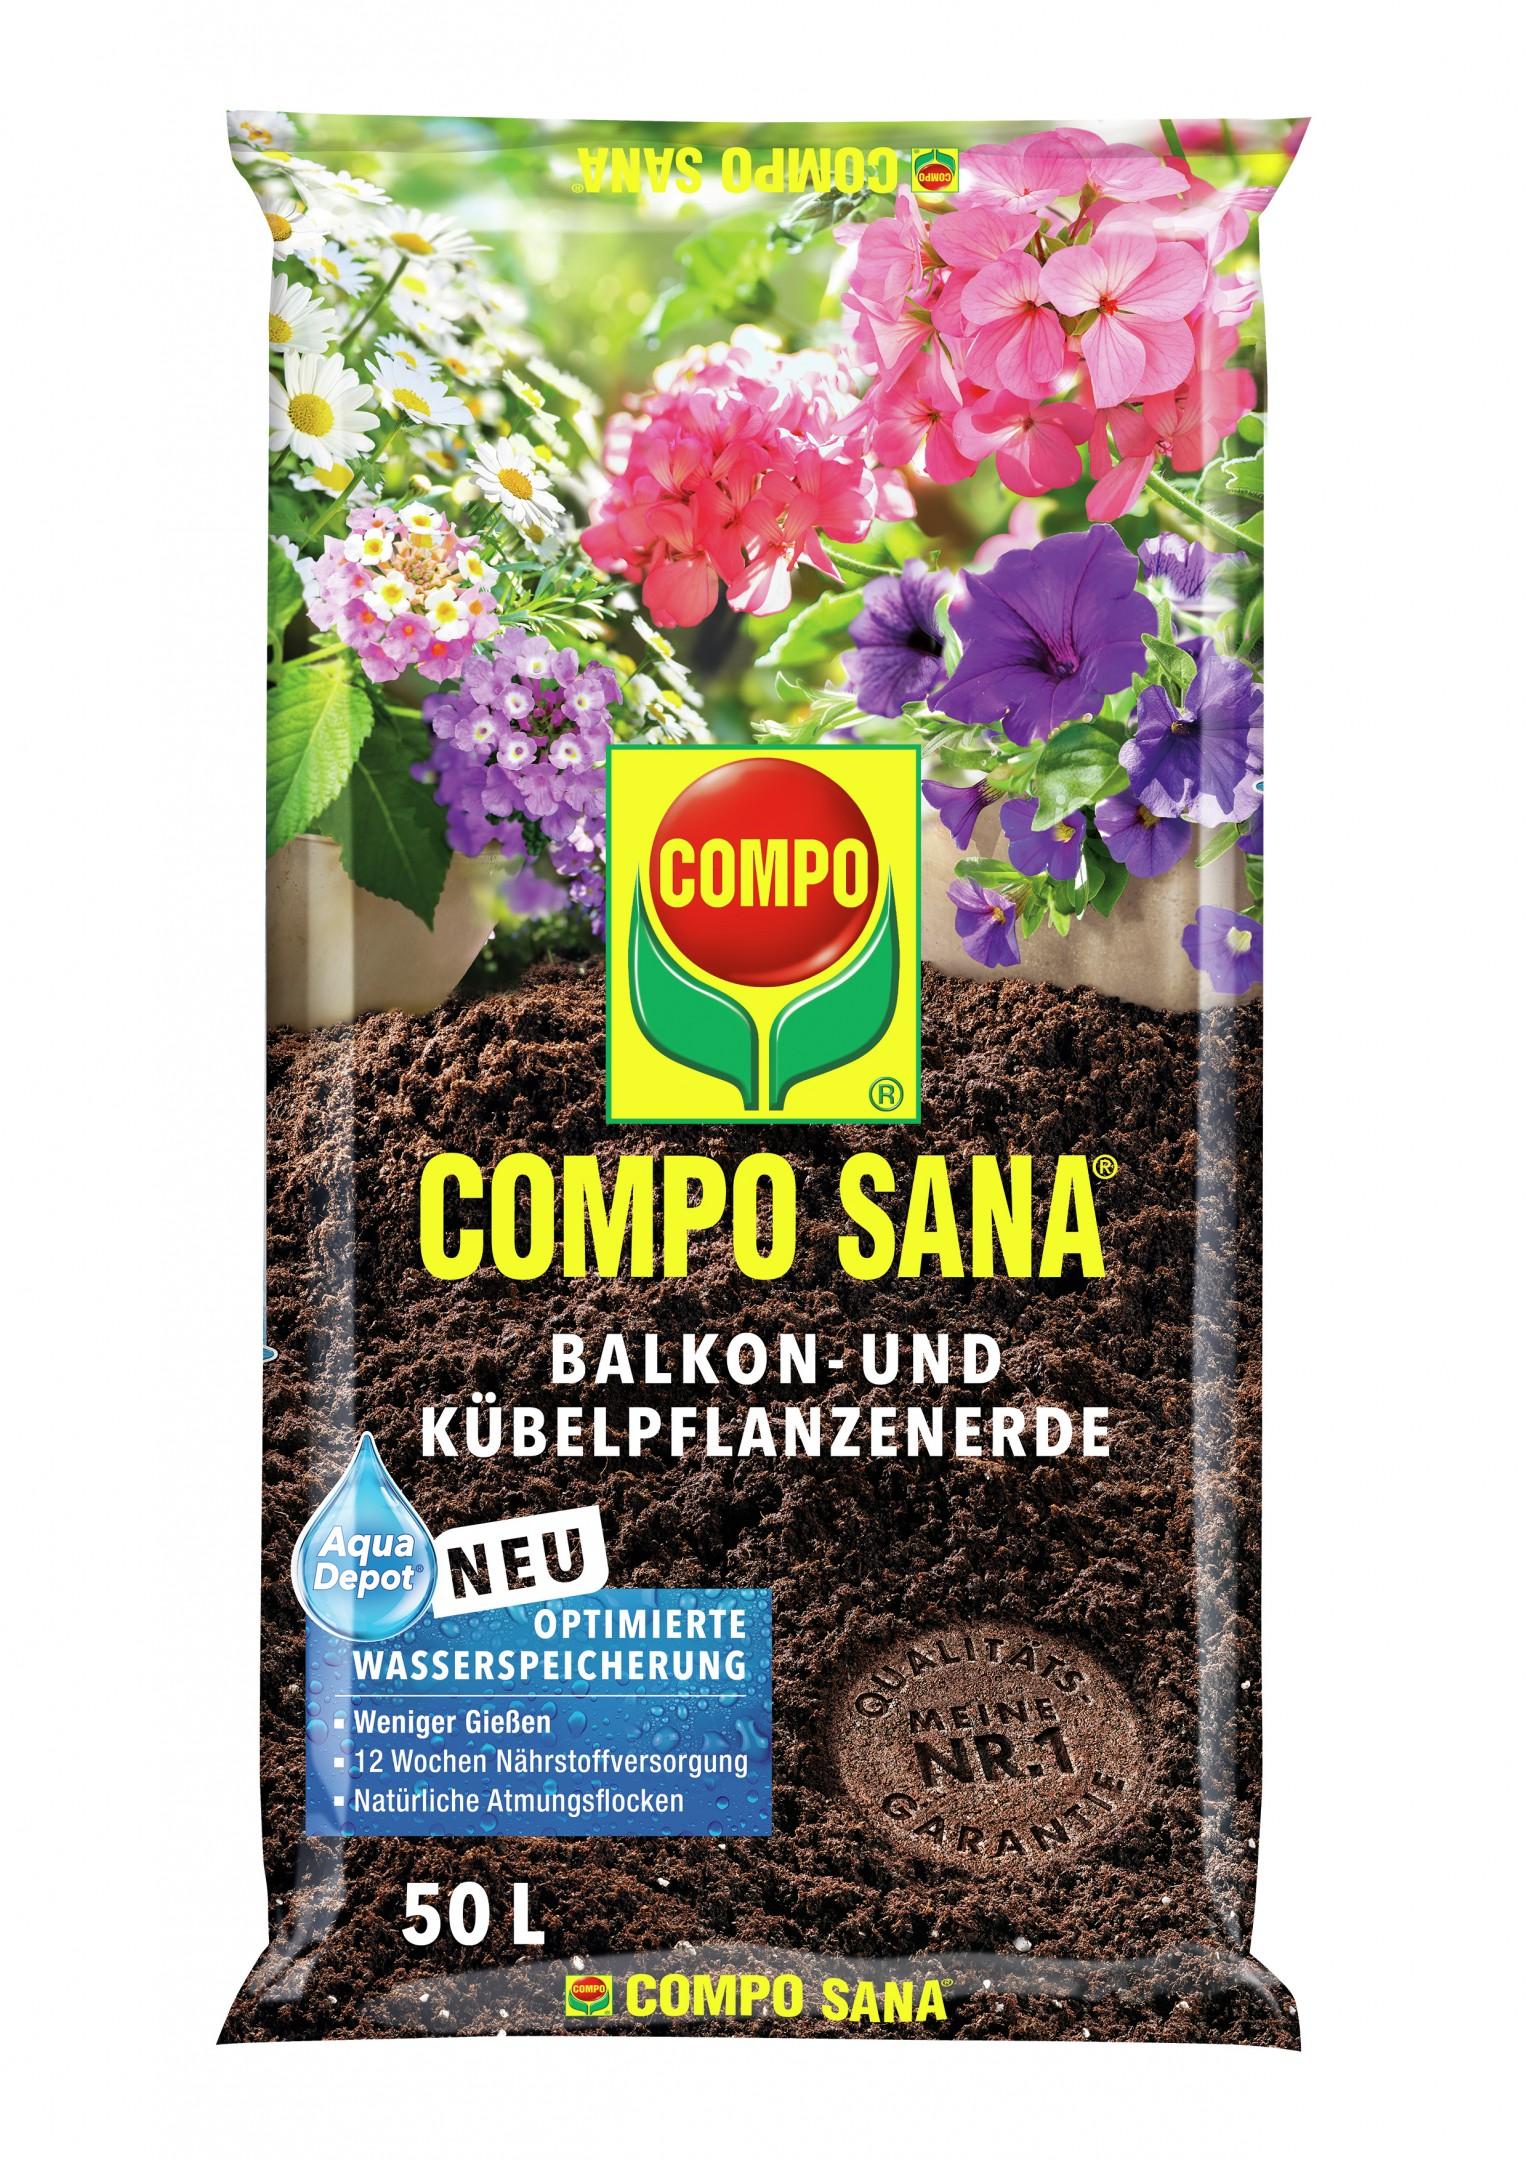 COMPO SANA Balkon- und Kübelpflanzenerde 60 L Bild 1